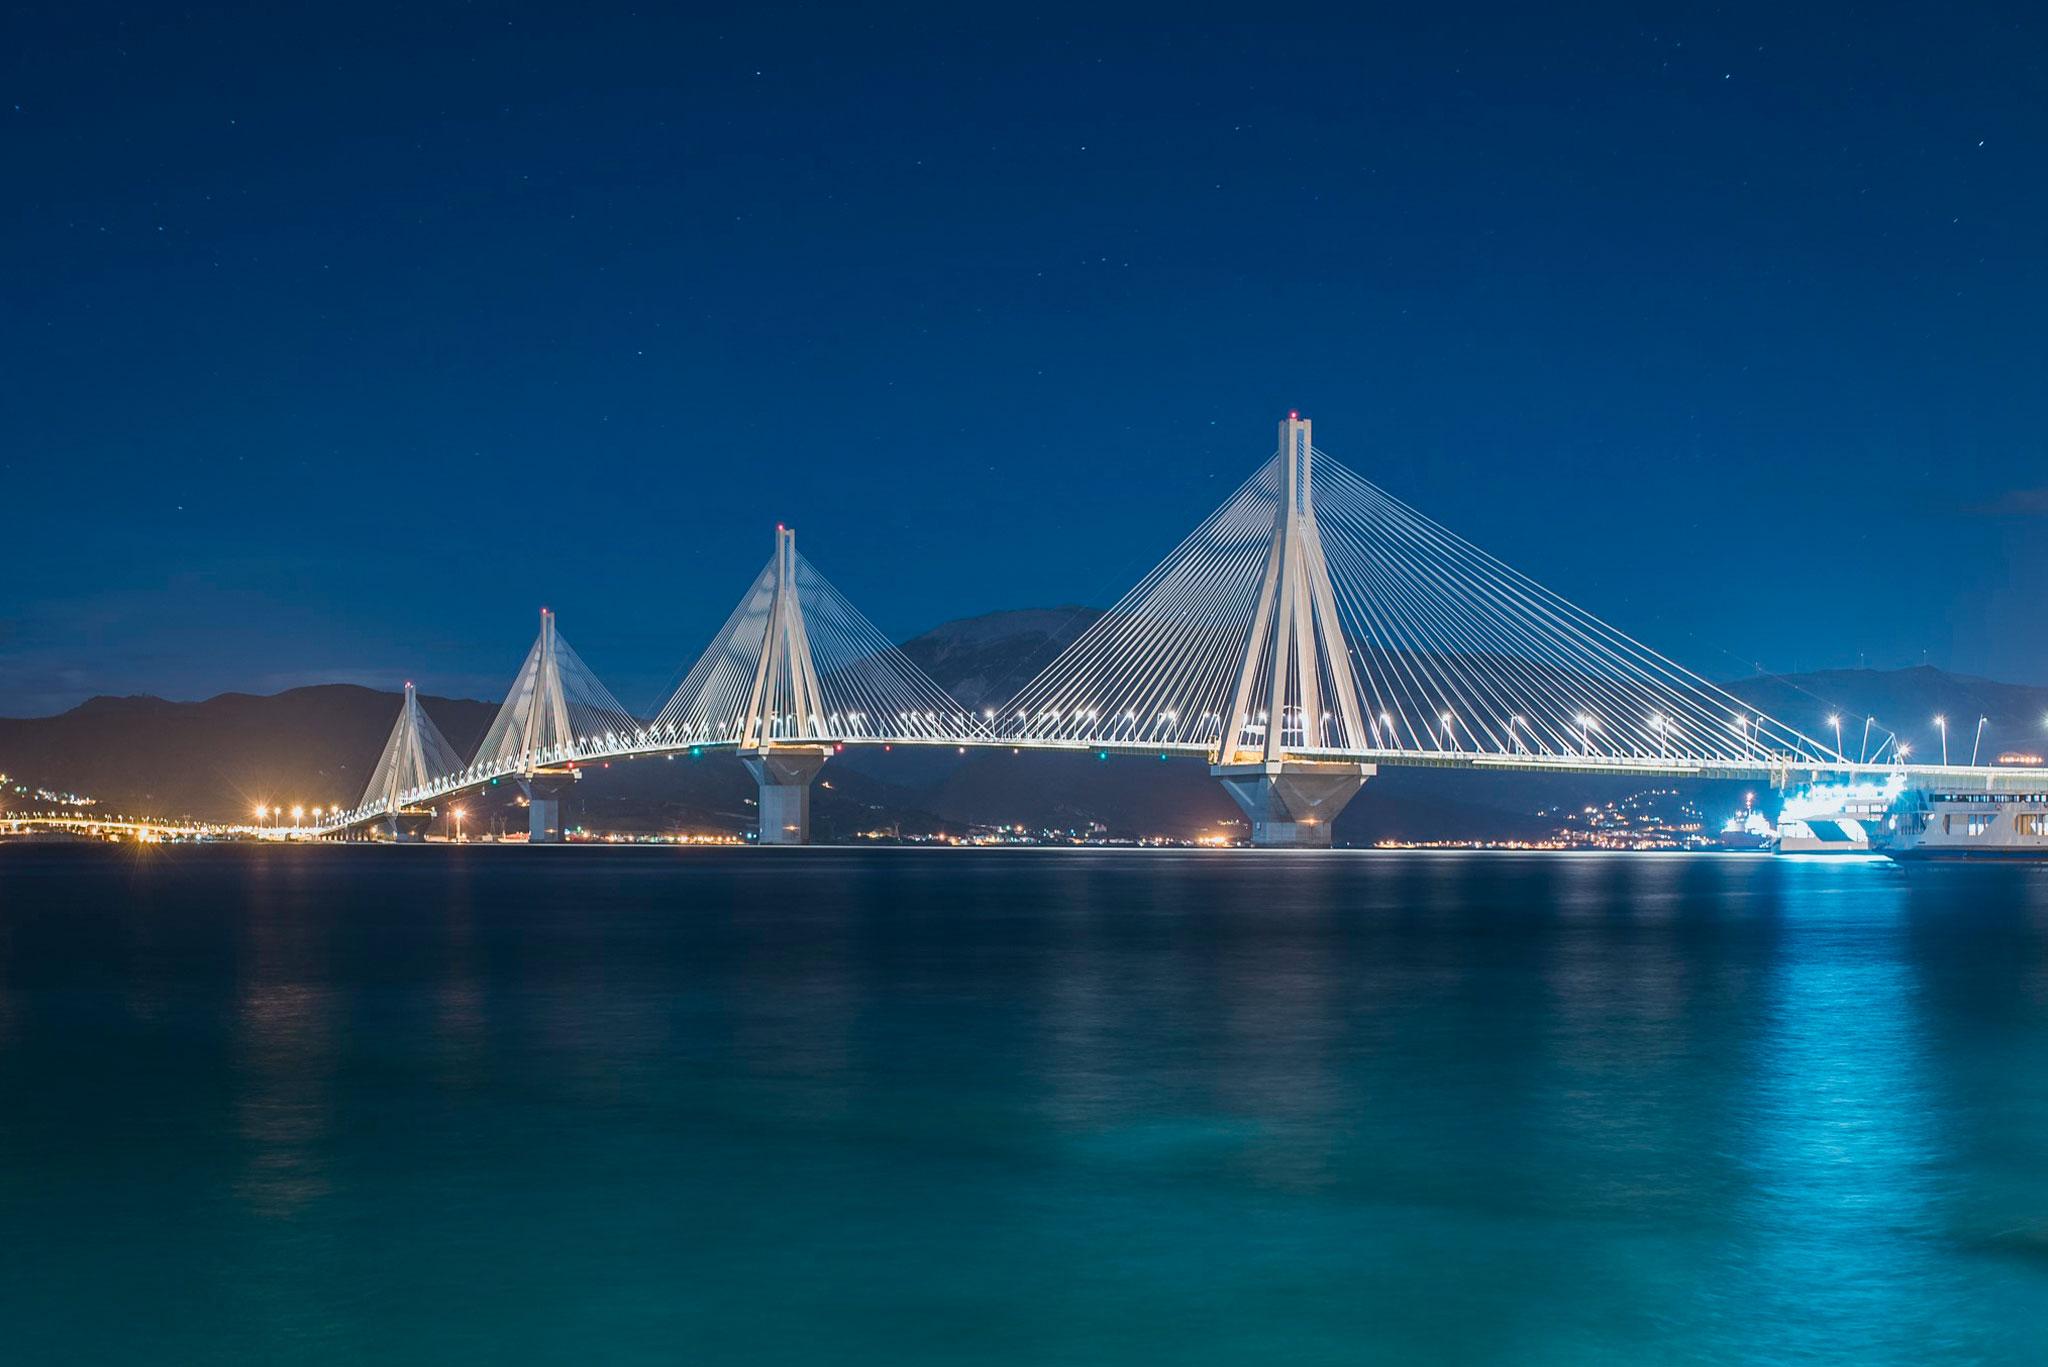 Distinto Rio bridge